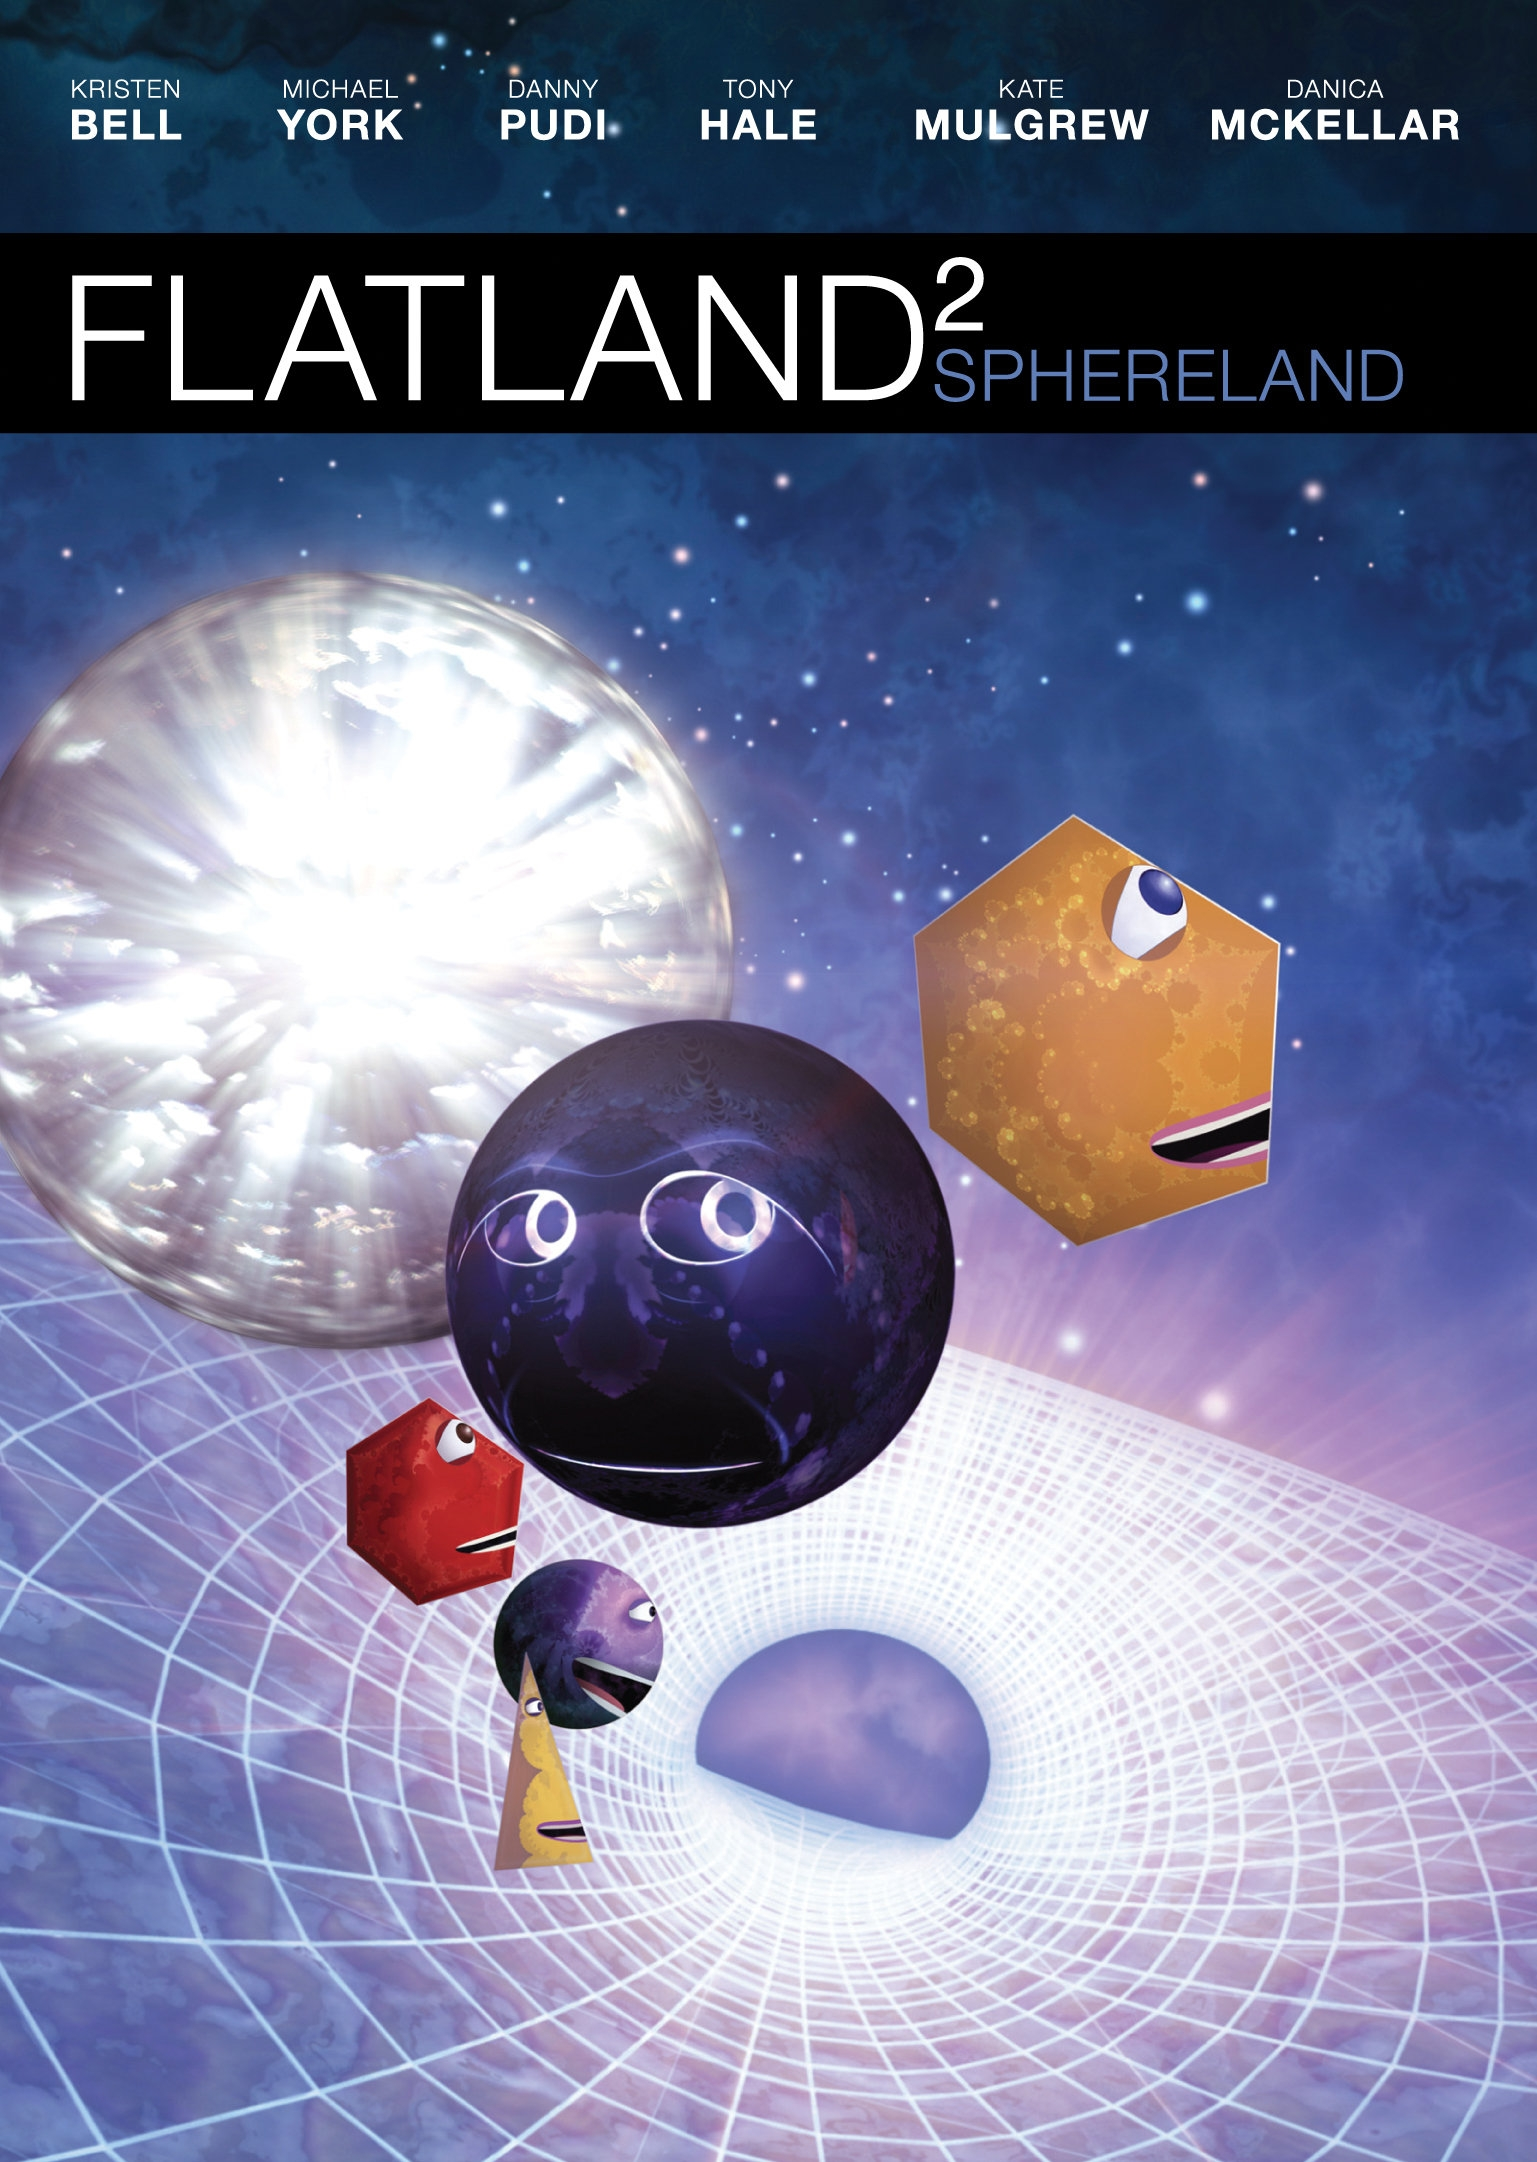 La locandina di Flatland 2: Sphereland